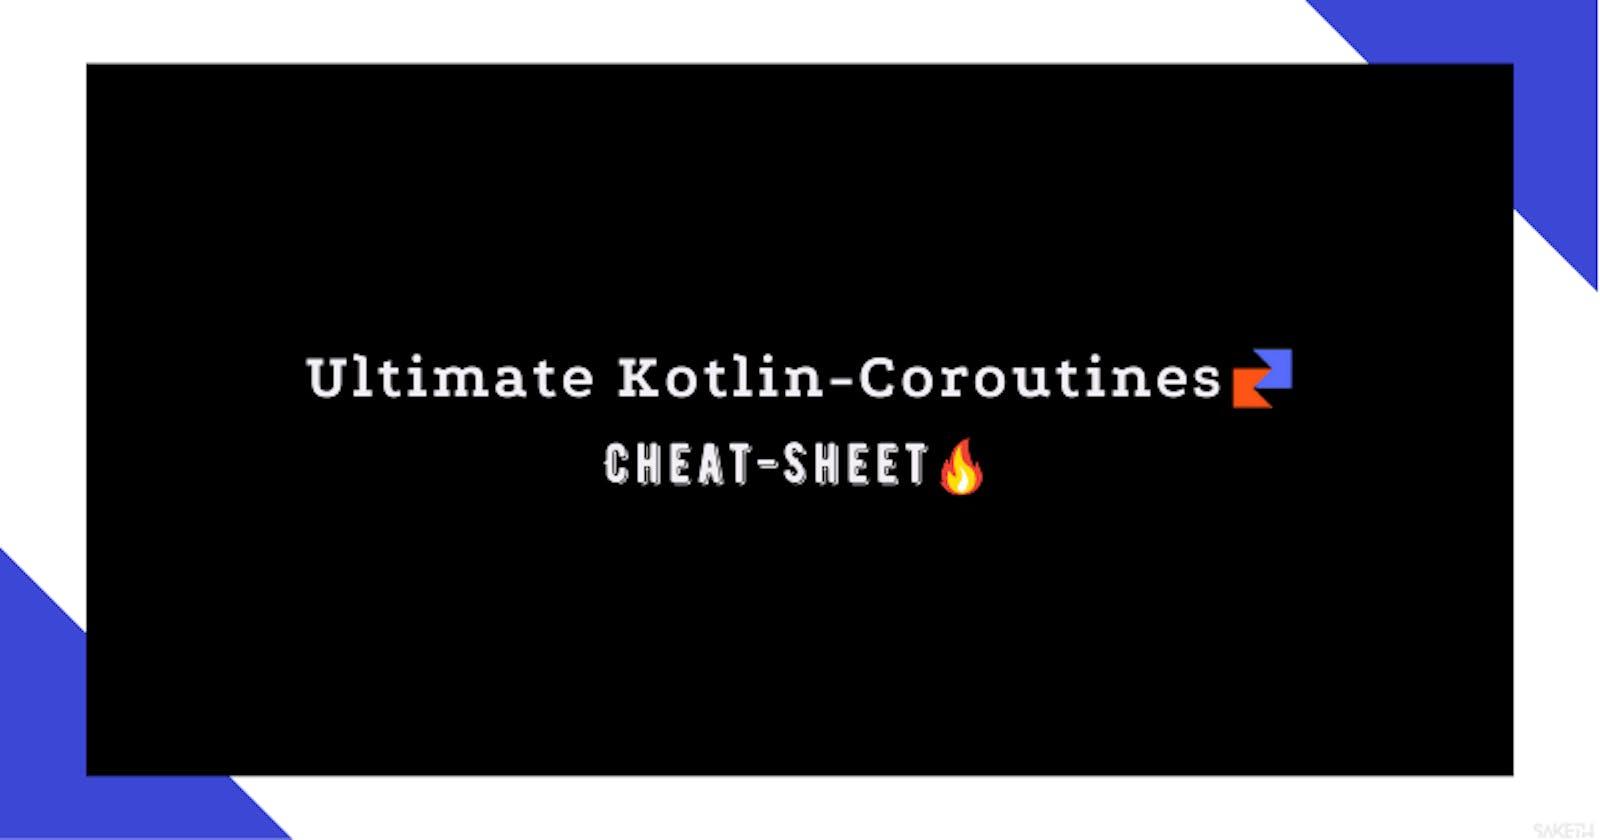 Ultimate Kotlin-Coroutines Cheat-Sheet